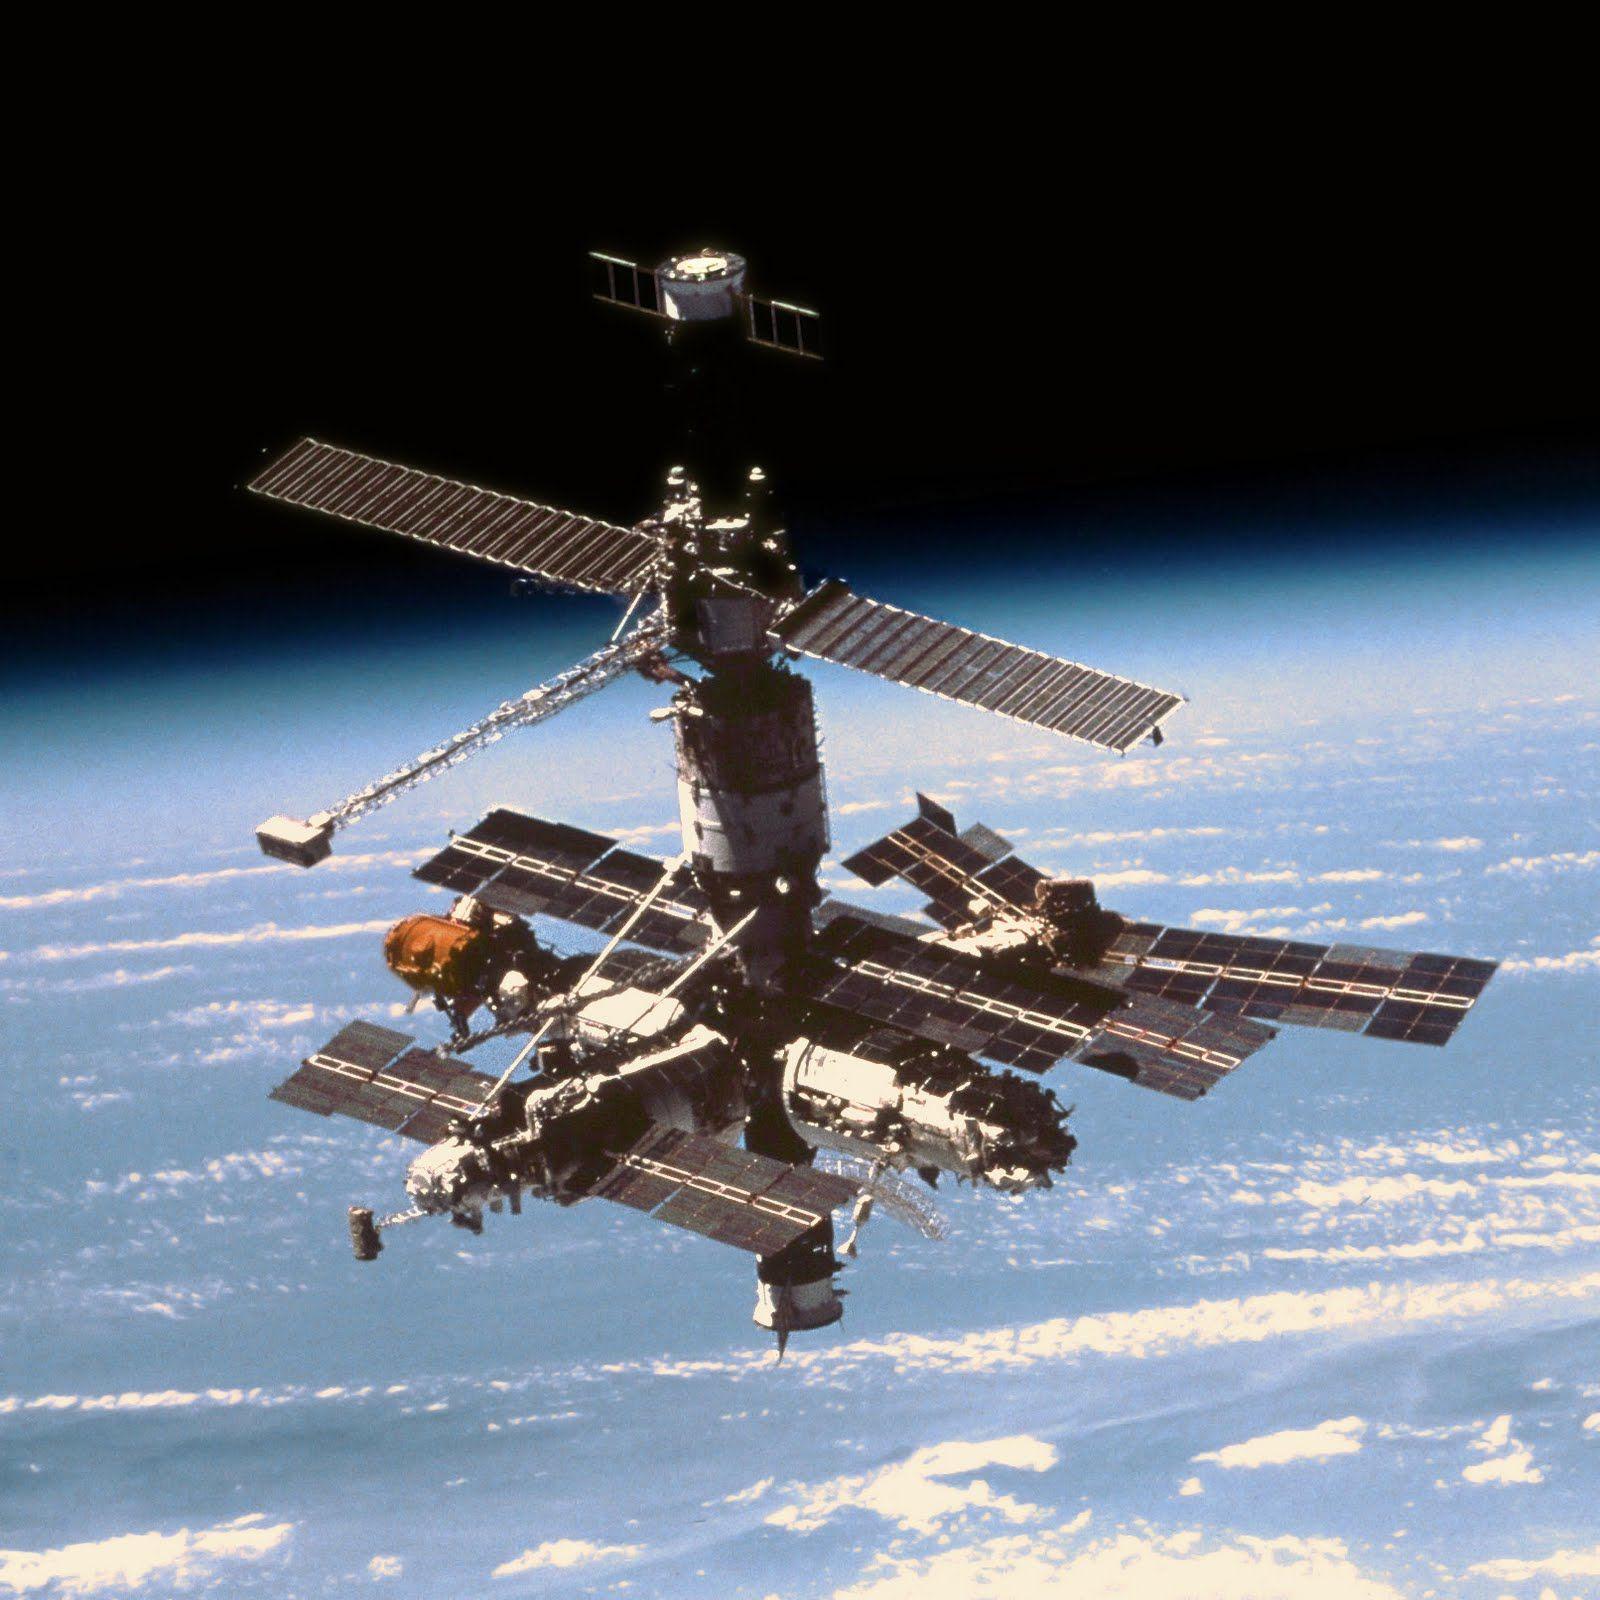 Mir Space Station Nasa Space Program Spacecraft